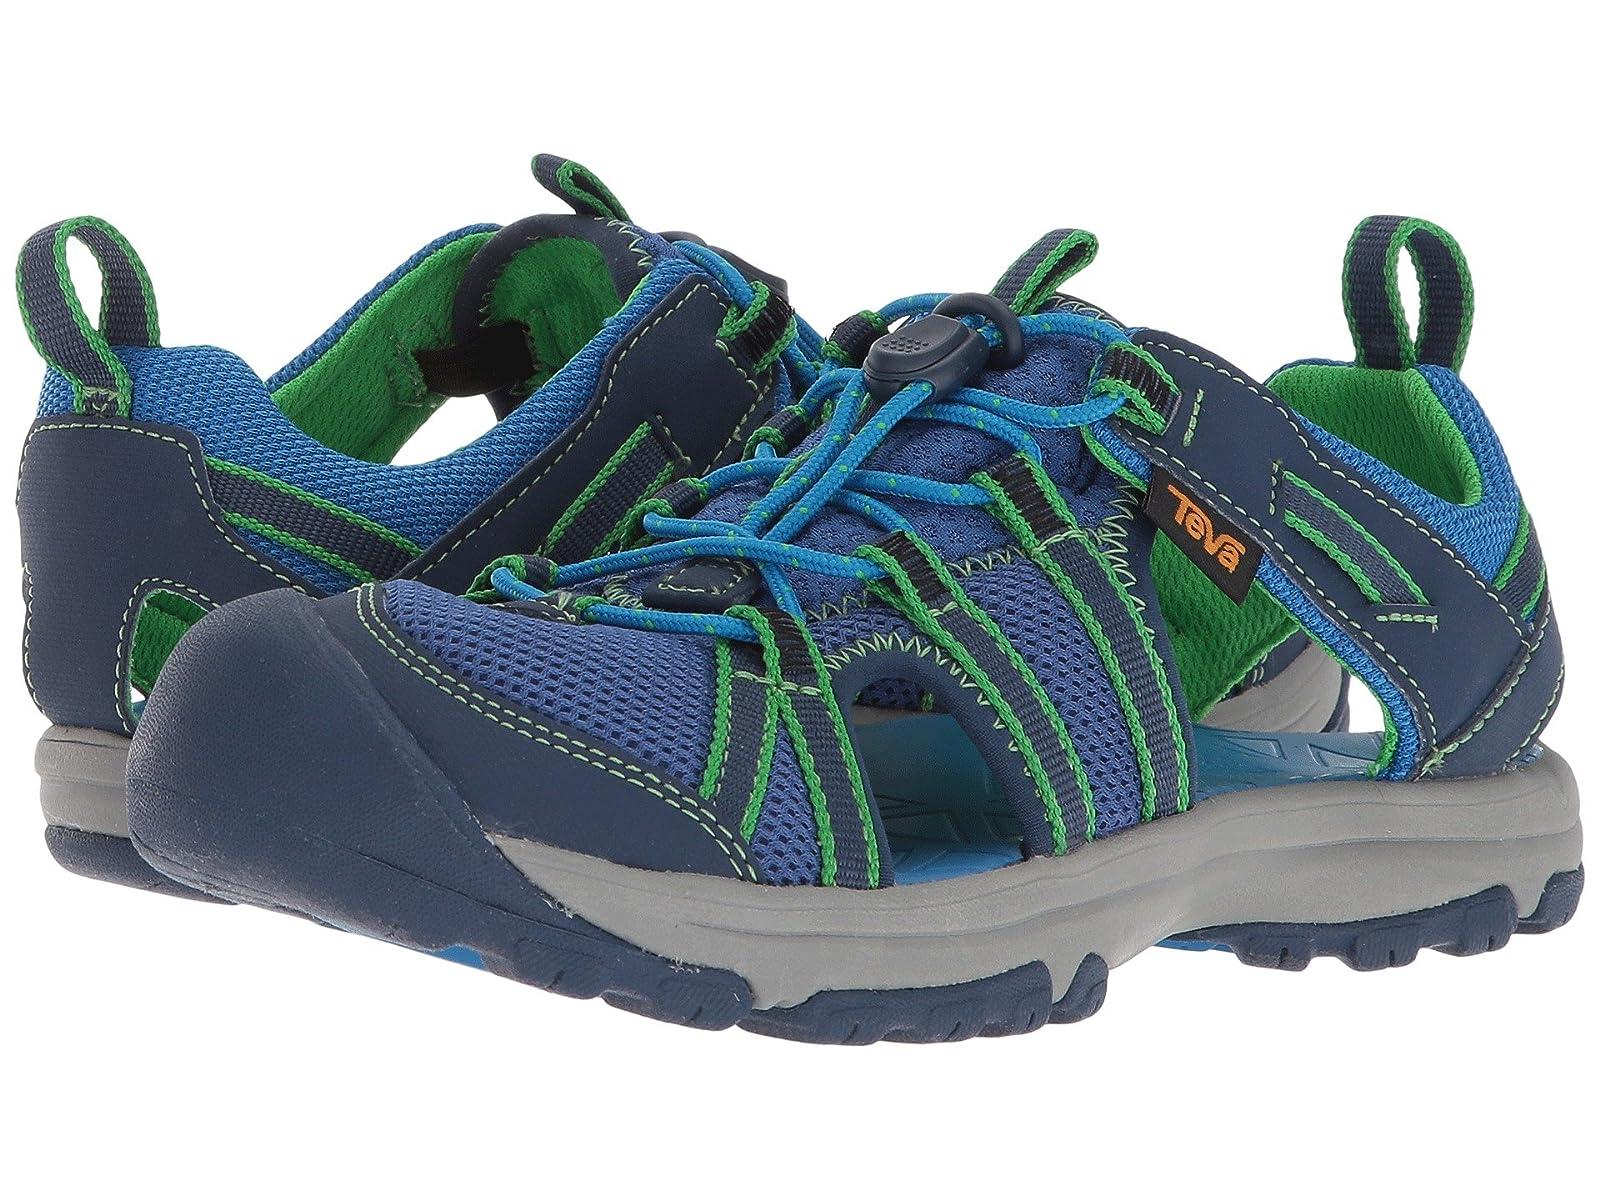 Teva Kids Manatee (Little Kid/Big Kid)Atmospheric grades have affordable shoes